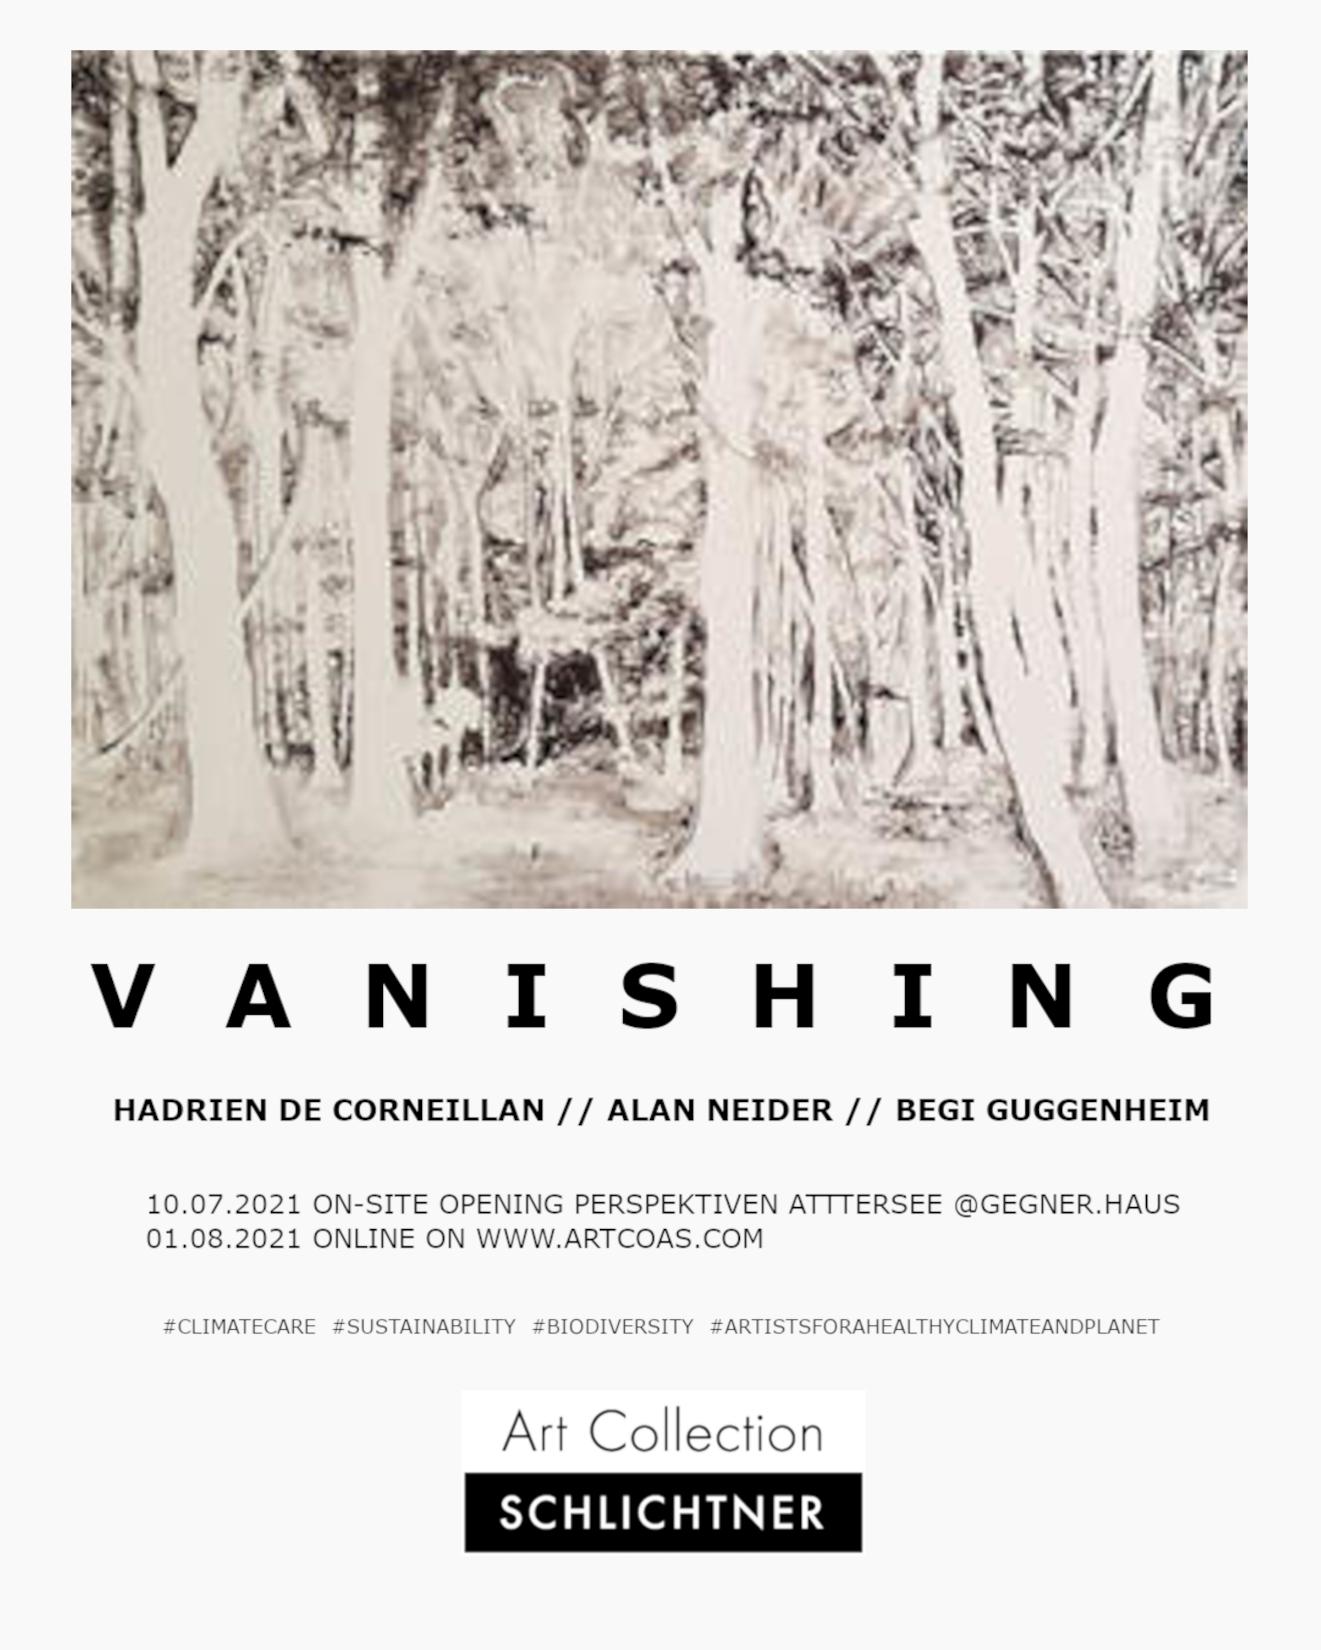 Hadrien de Corneillan // Alan Neider // Begi Guggenheim, VANISHING, an exhibition about #climatecare @ Gegner.Haus, Perspektiven Attersee 2021